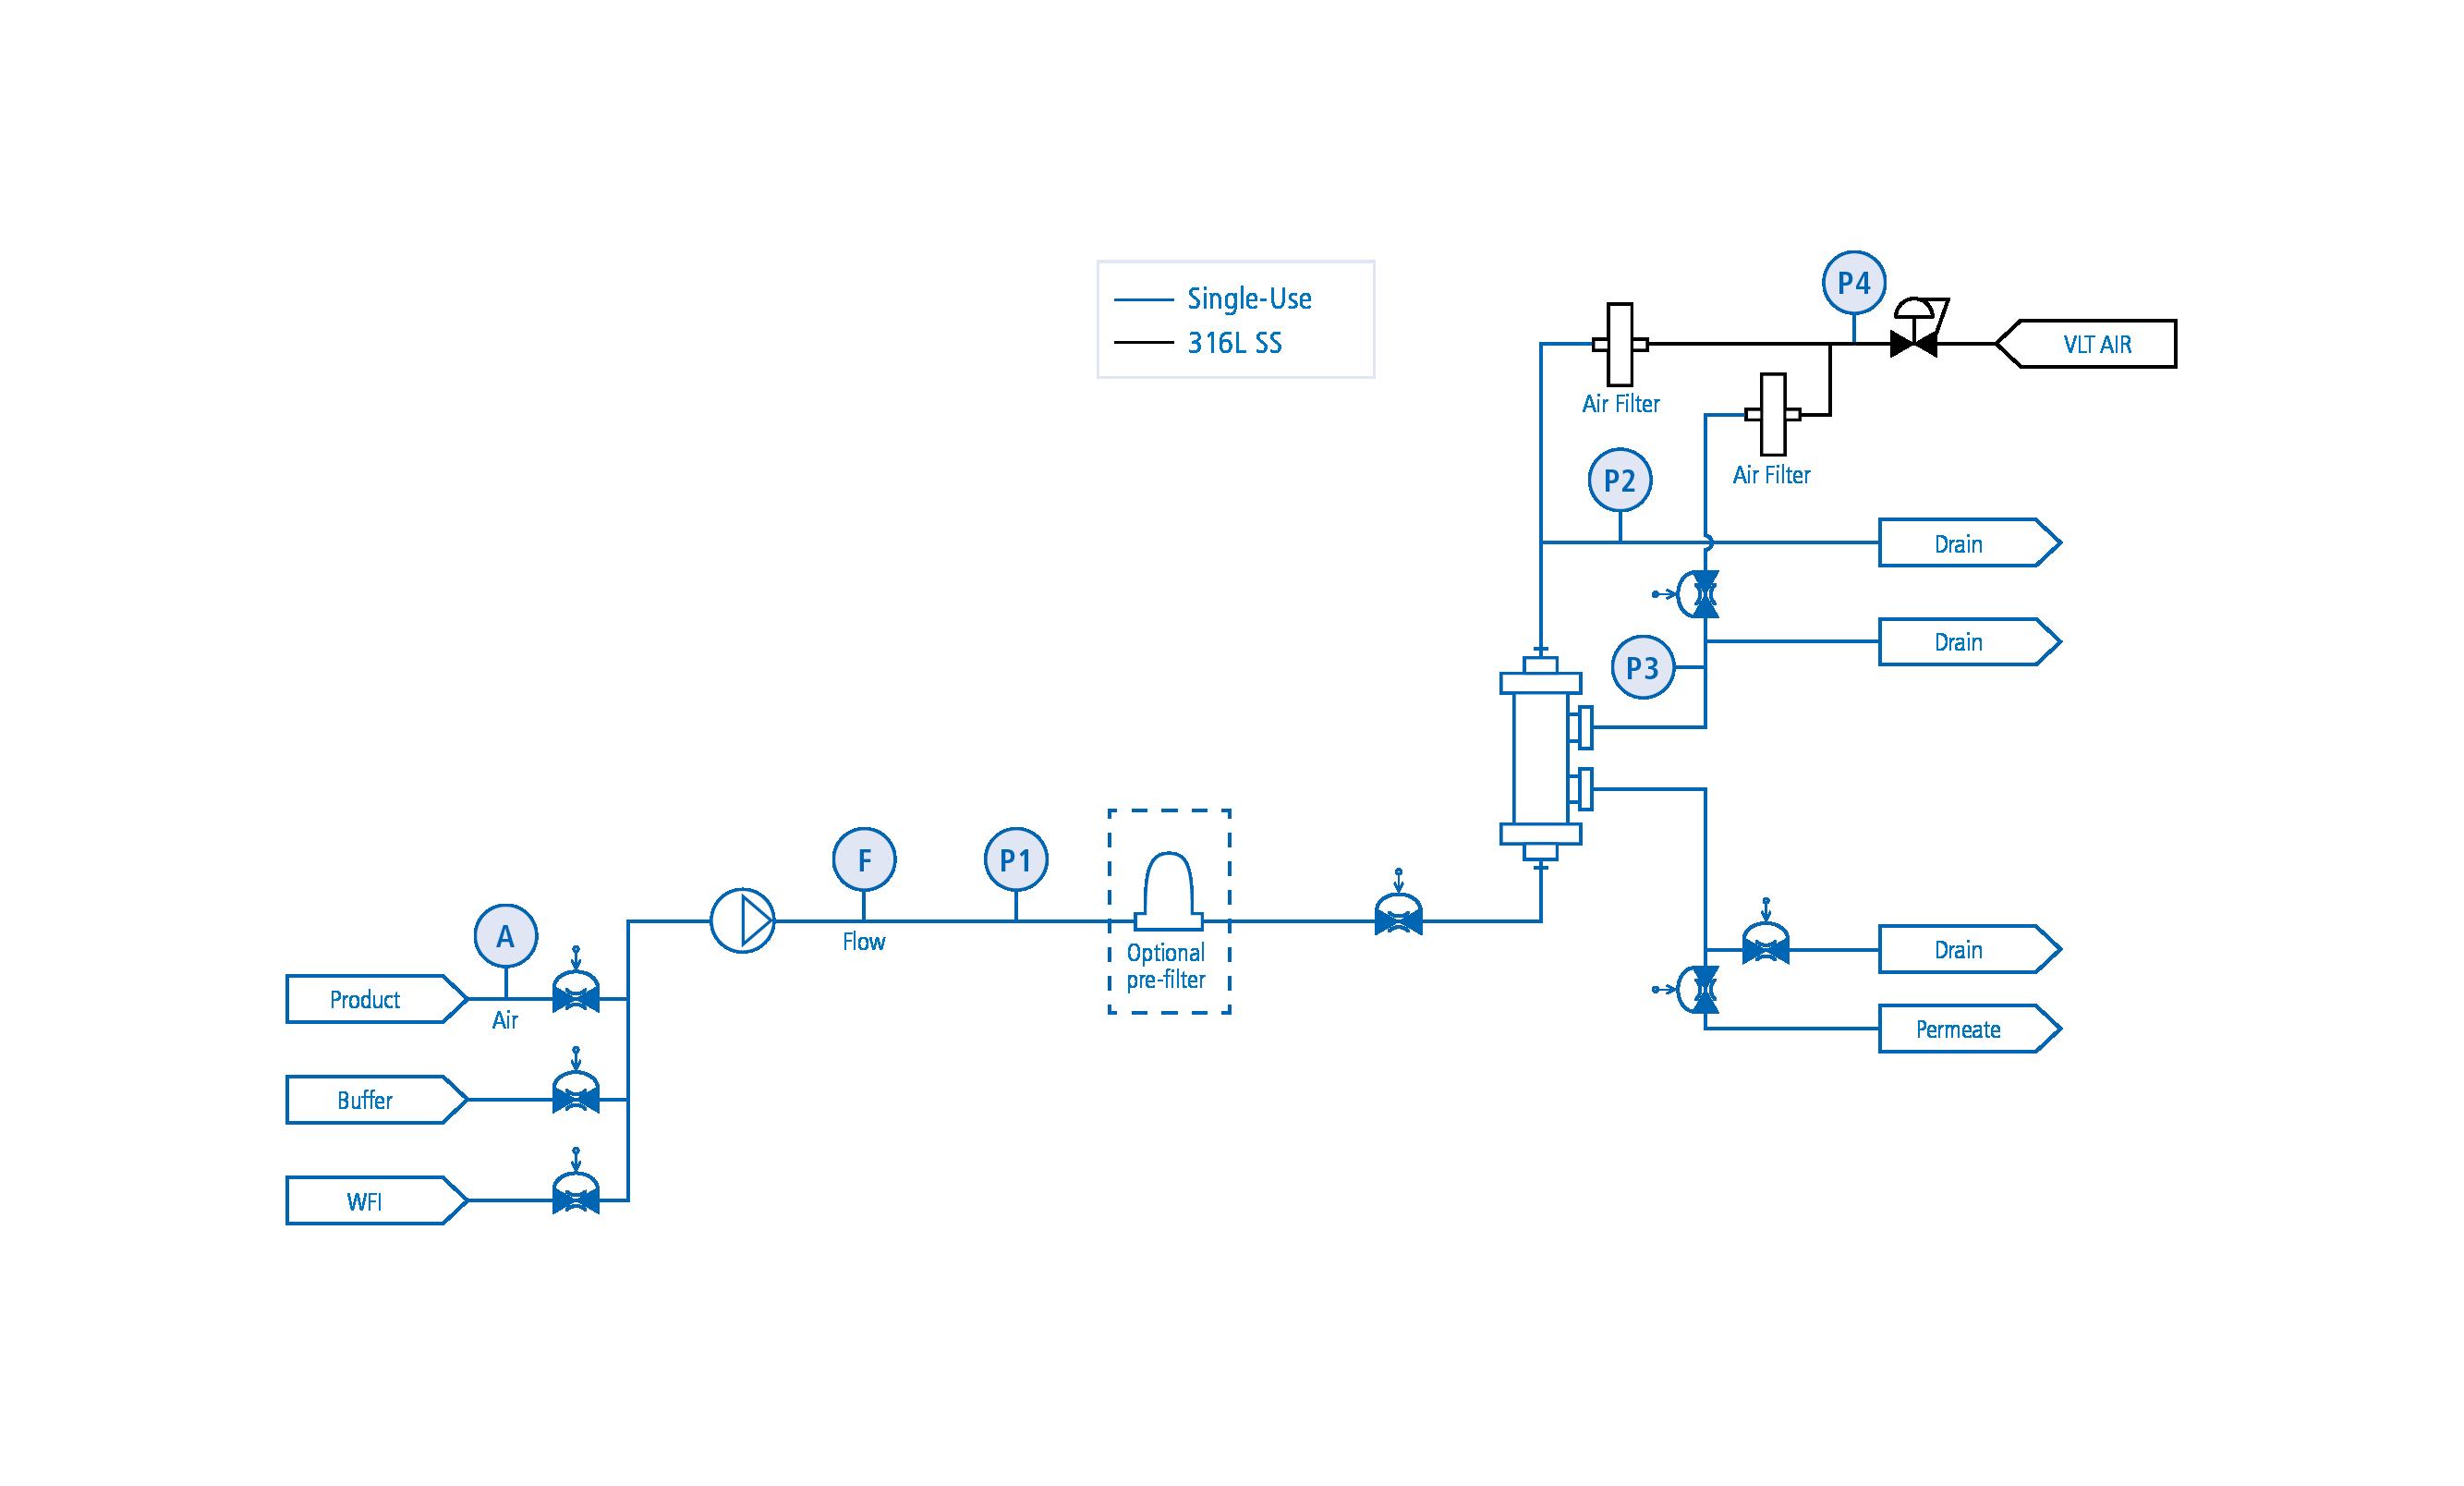 SU VFC diagram